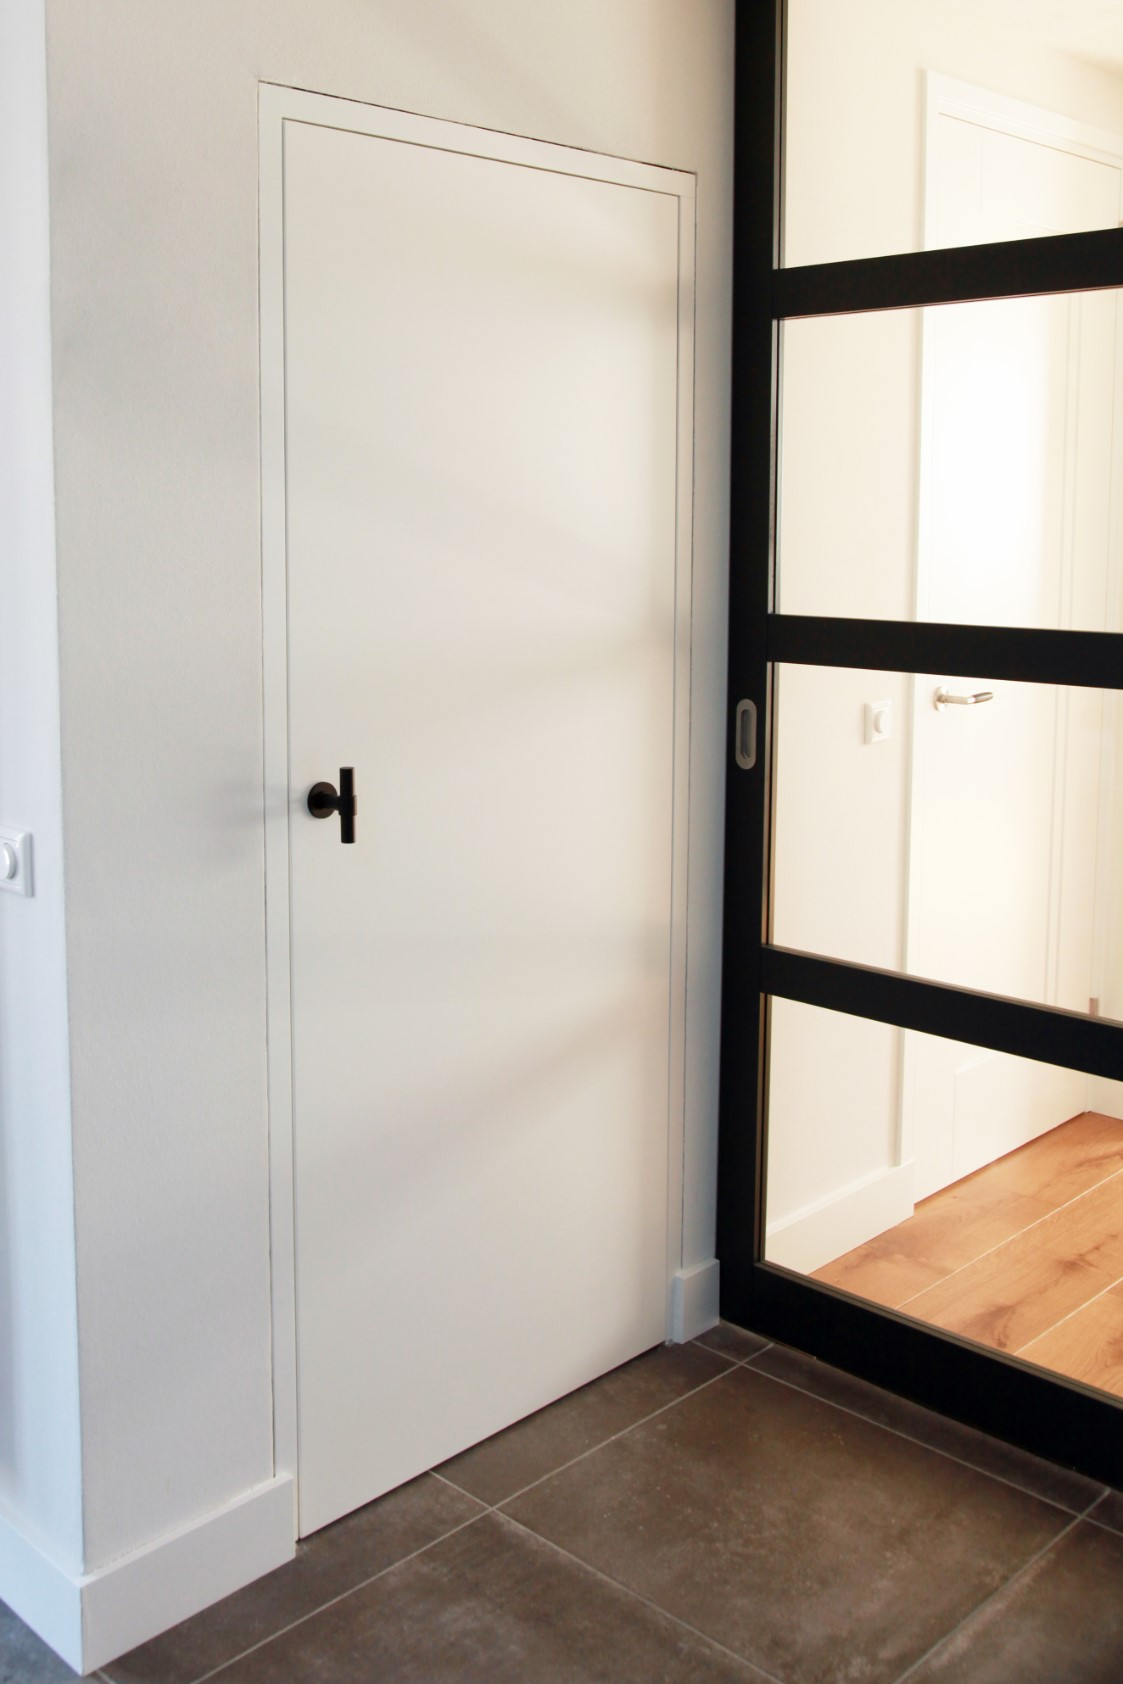 beste wanddecoratie 187 piet boon amsterdam deur wanddecoratie